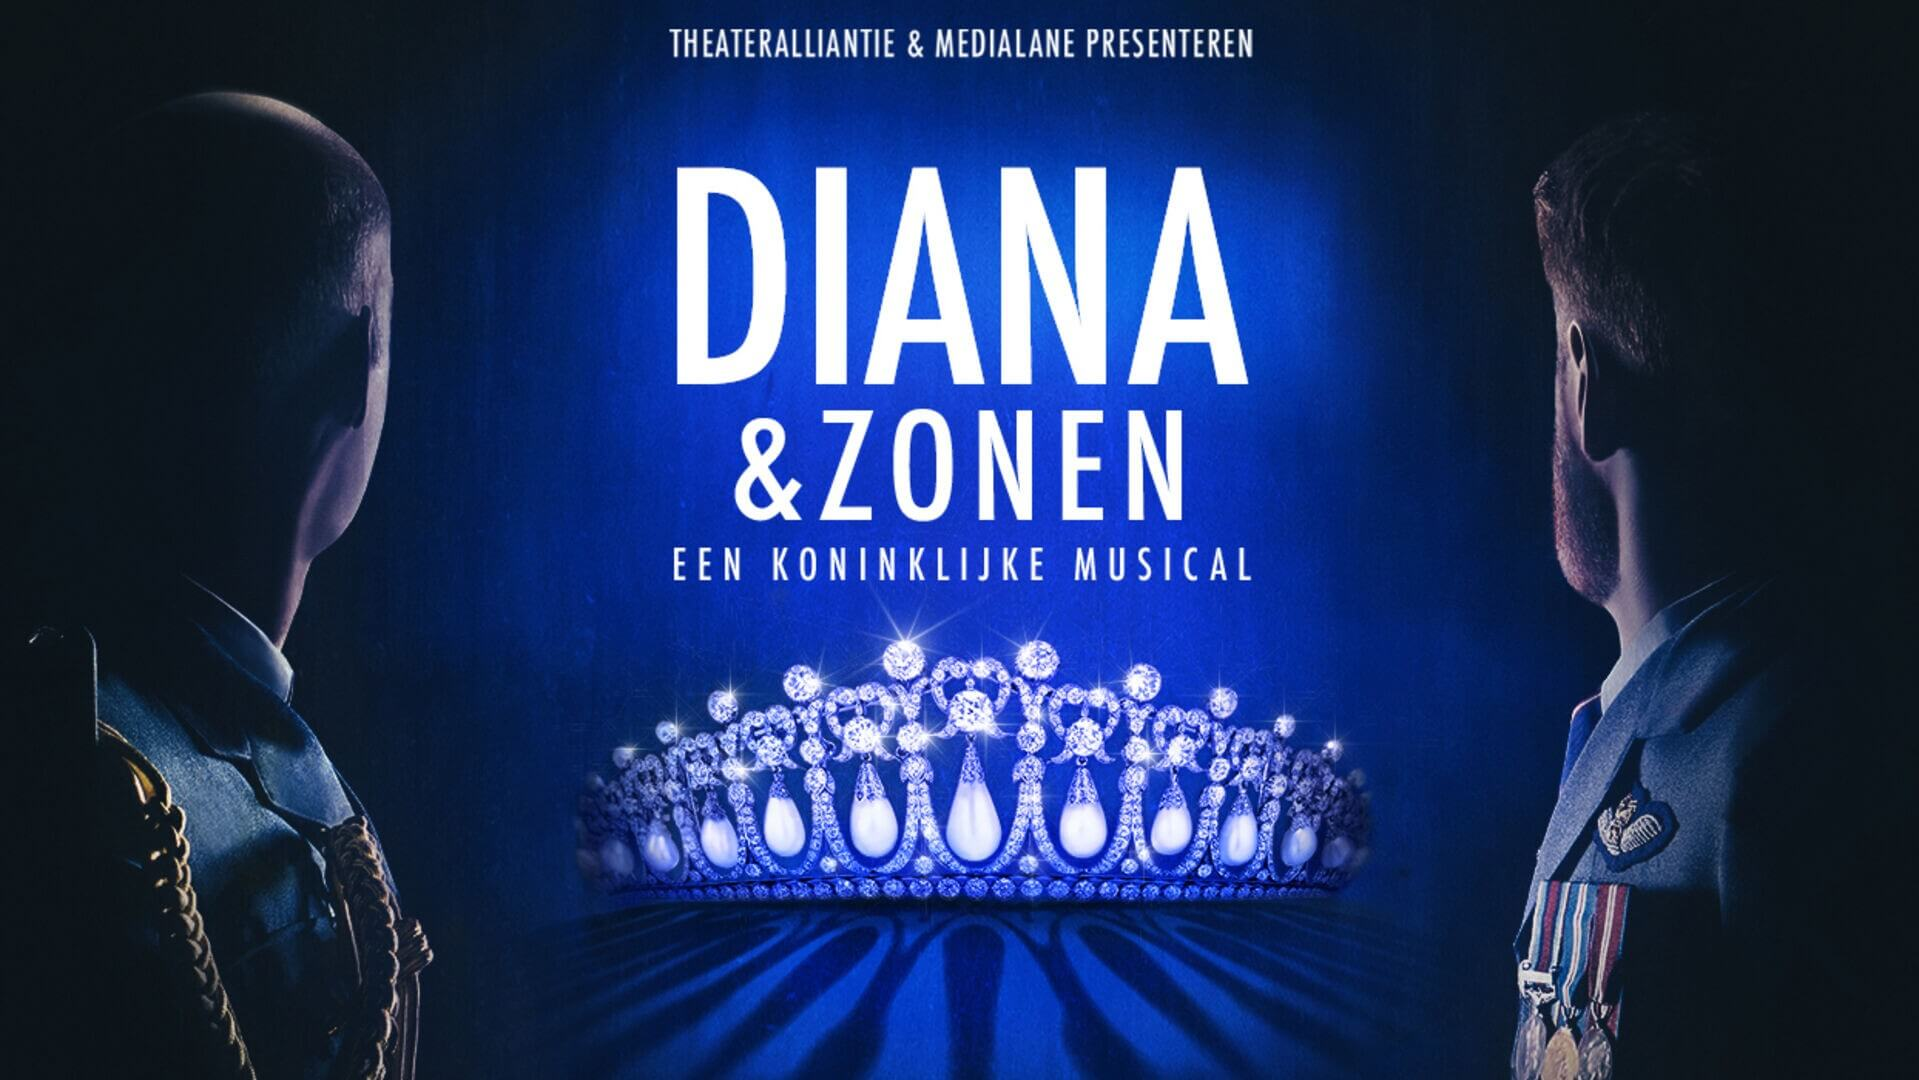 Diana Zonen - Theateralliantie / MediaLane